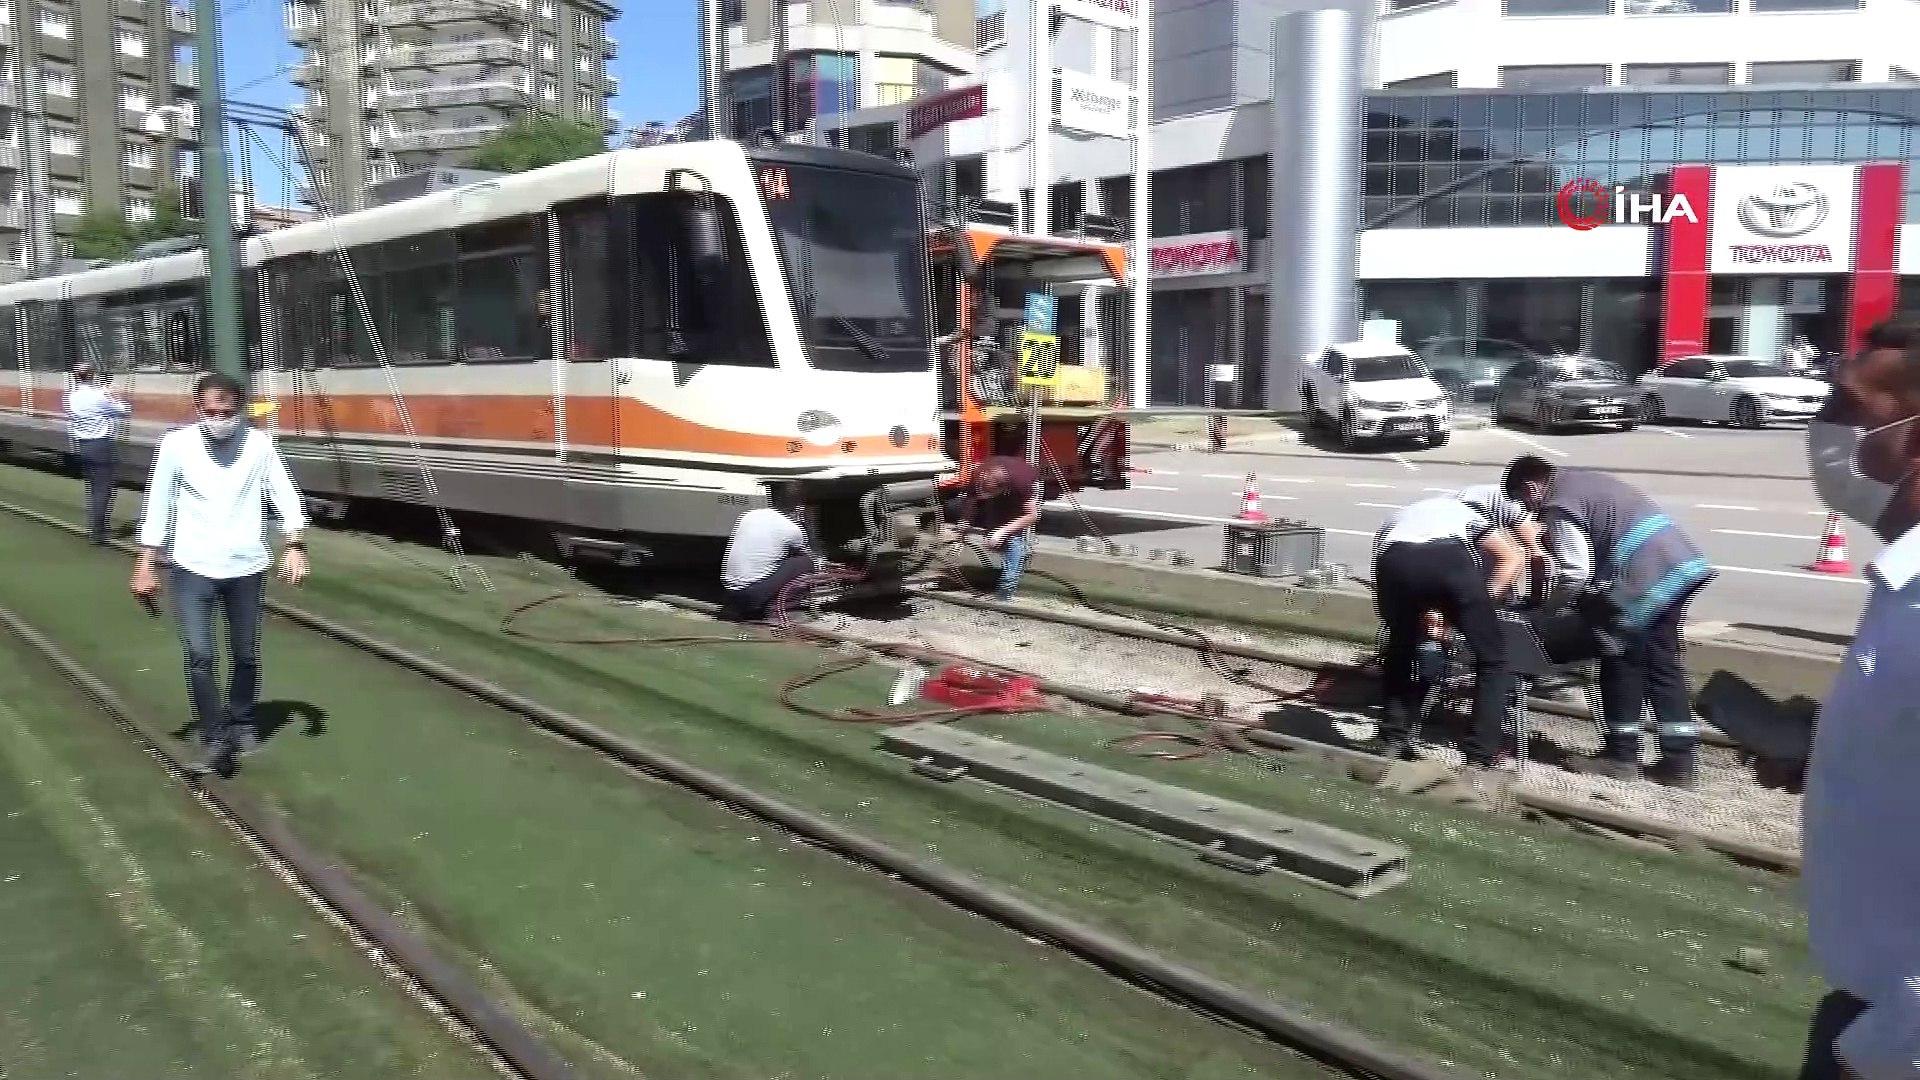 Gaziantep'te tramvay raydan çıktı - Dailymotion Video